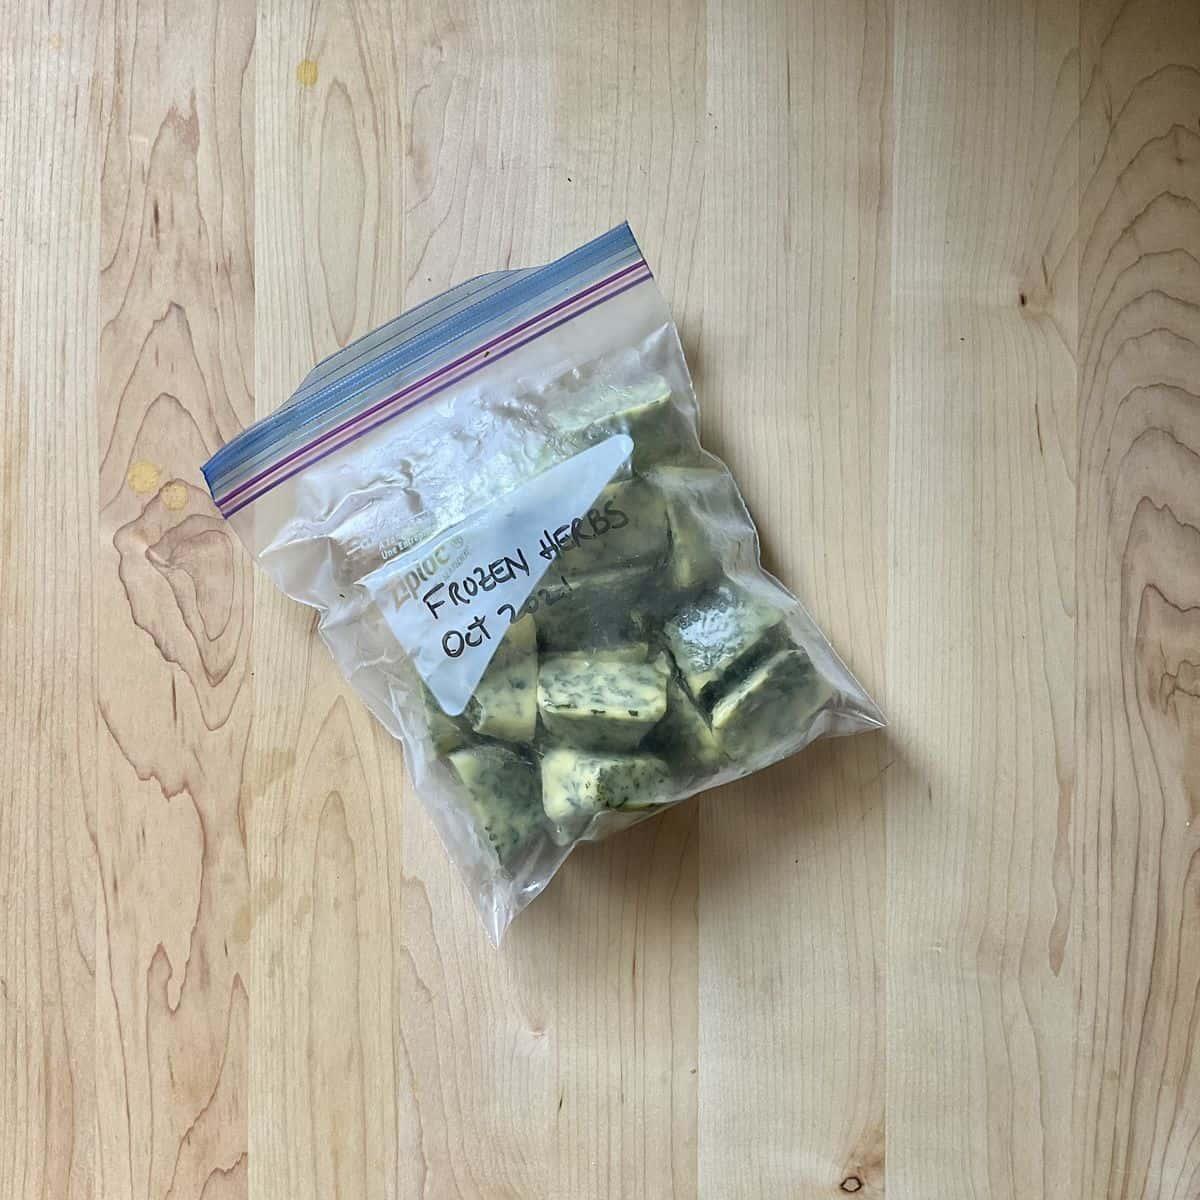 Frozen ice cubes of herbs in a plastic freezer bag.